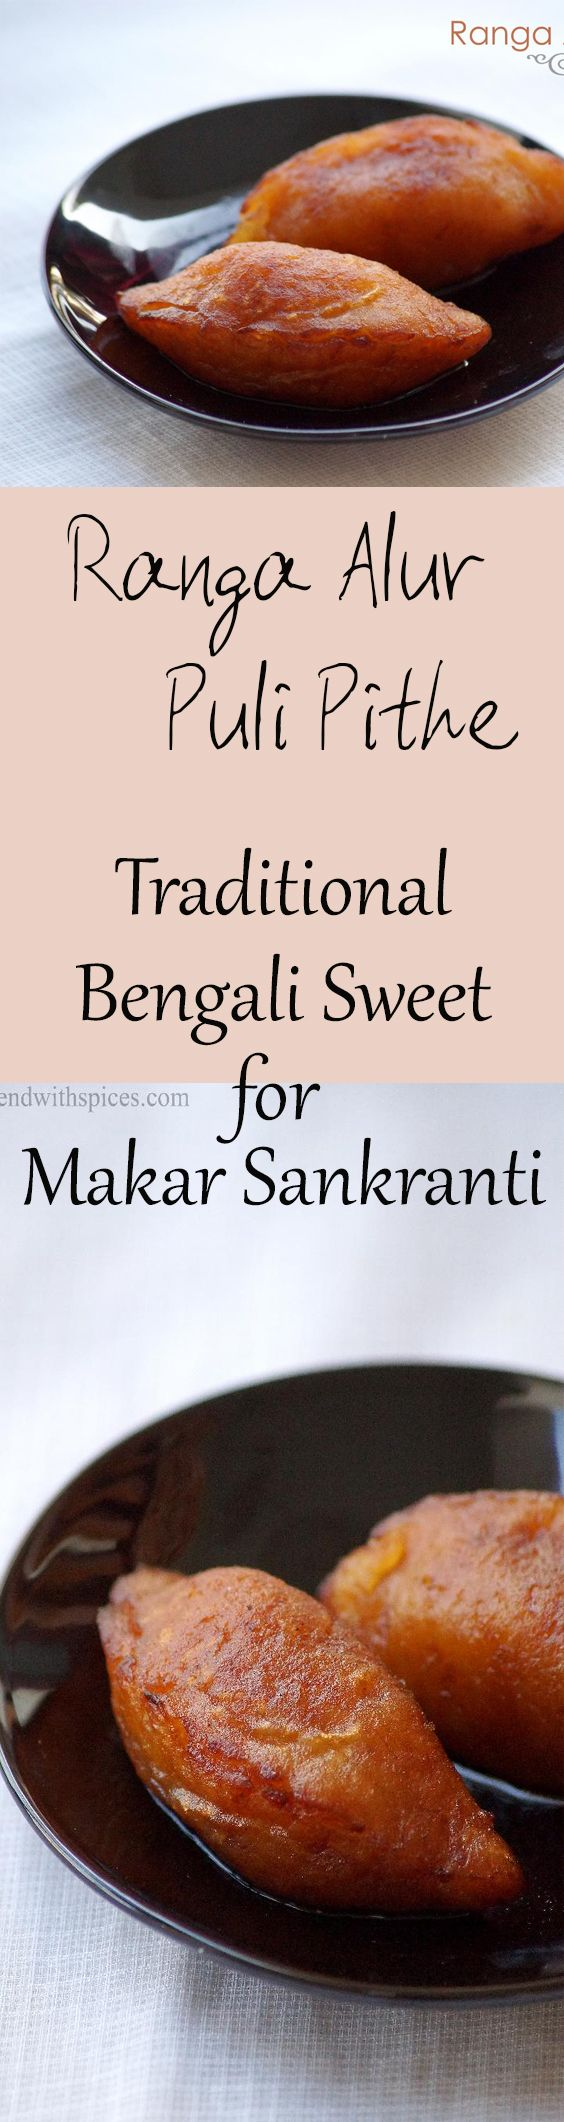 Ranga Alur Puli Pithe Recipe - Coconut Stuffed Sweet Potato Dumplings in Syrup - A Traditional Bengali Sweet Recipe for Poush Sankranti / Makar Sankranti Festival. Step by Step Recipe. blendwithspices.com